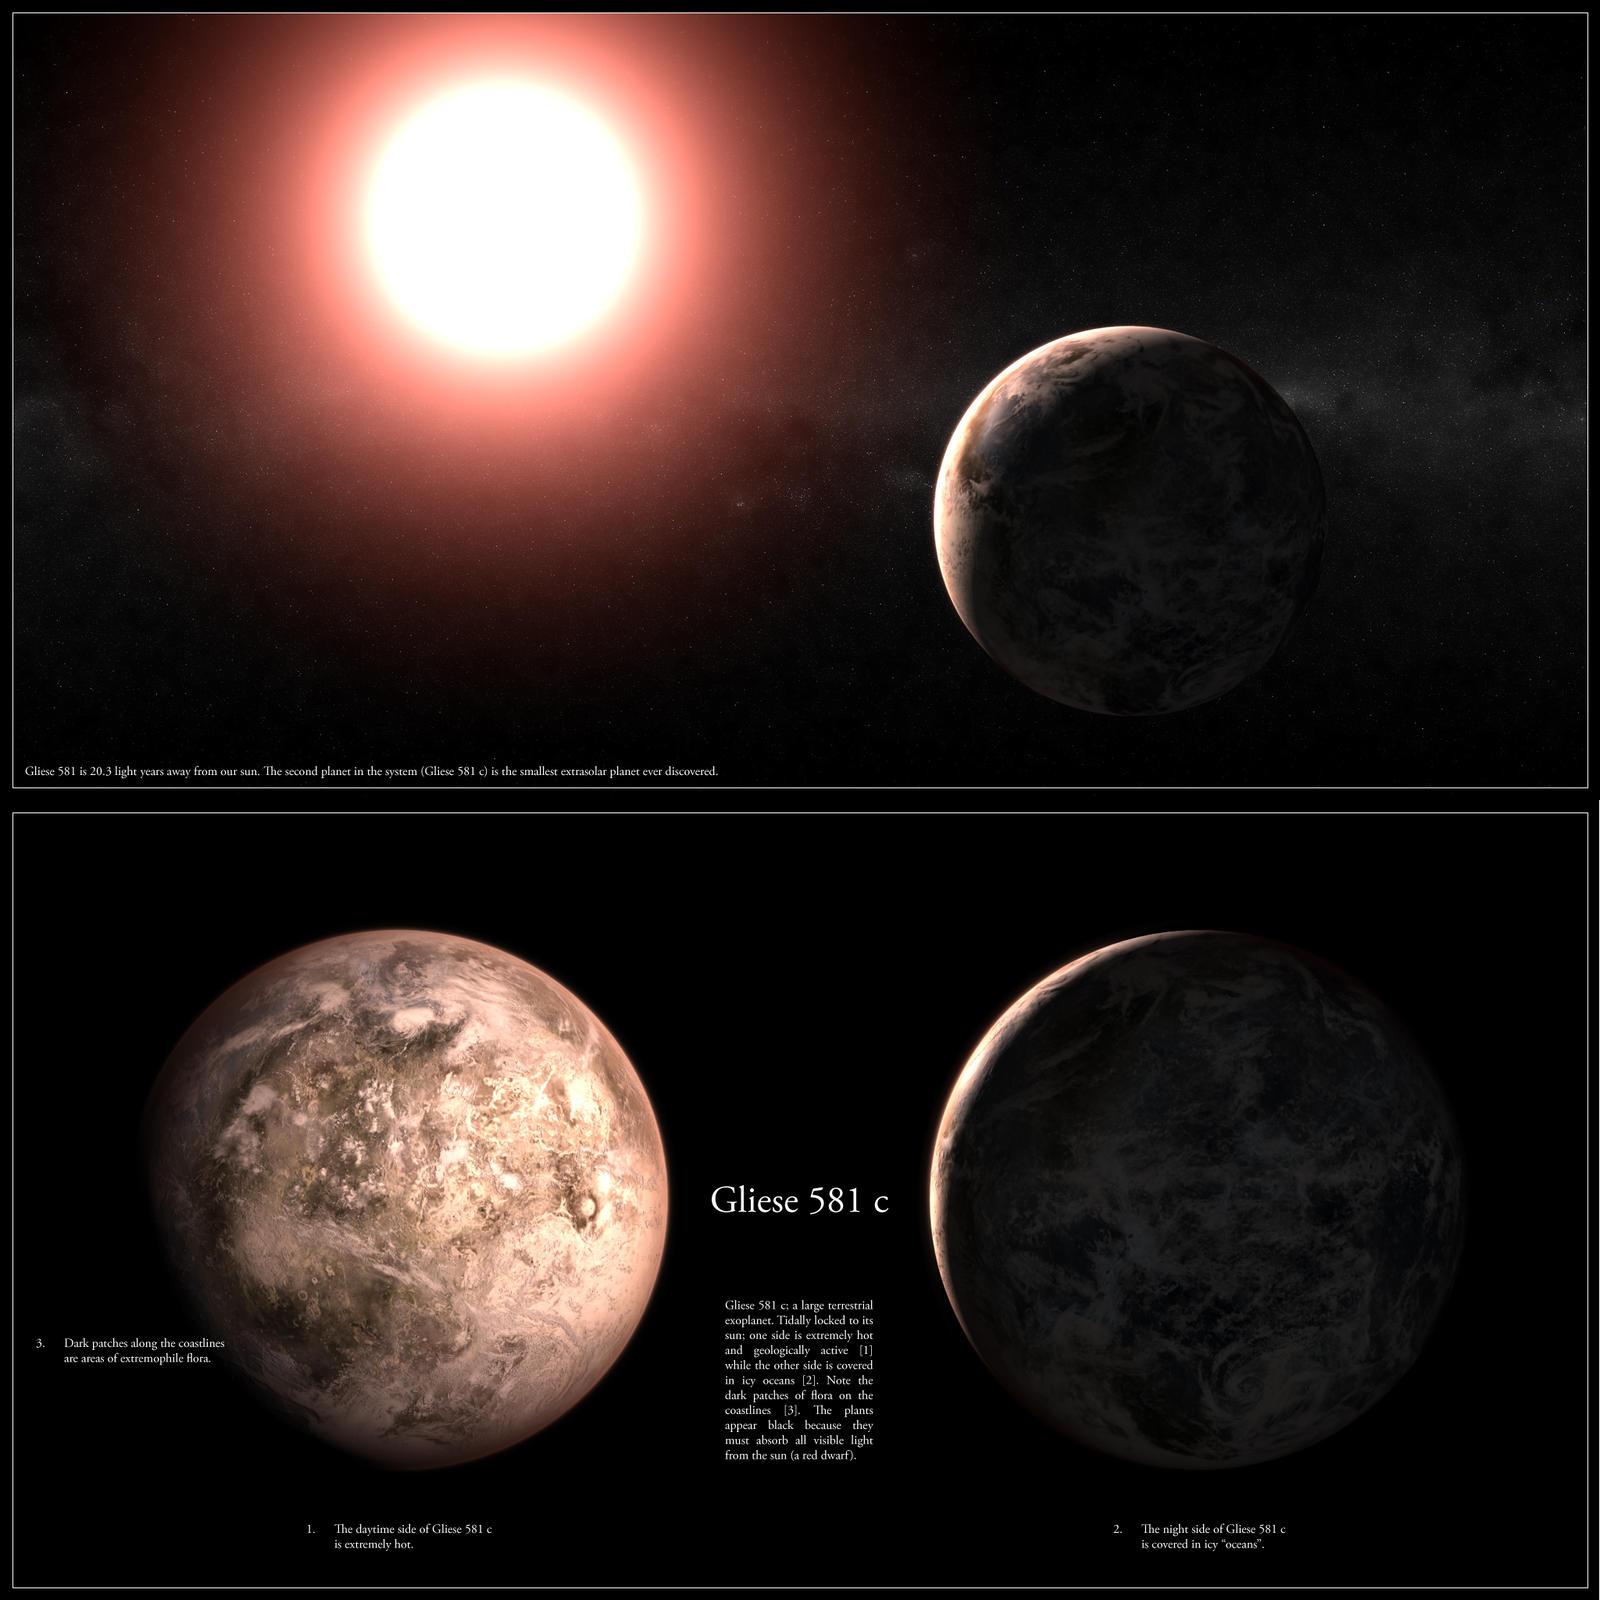 gliese 581 c info - photo #38